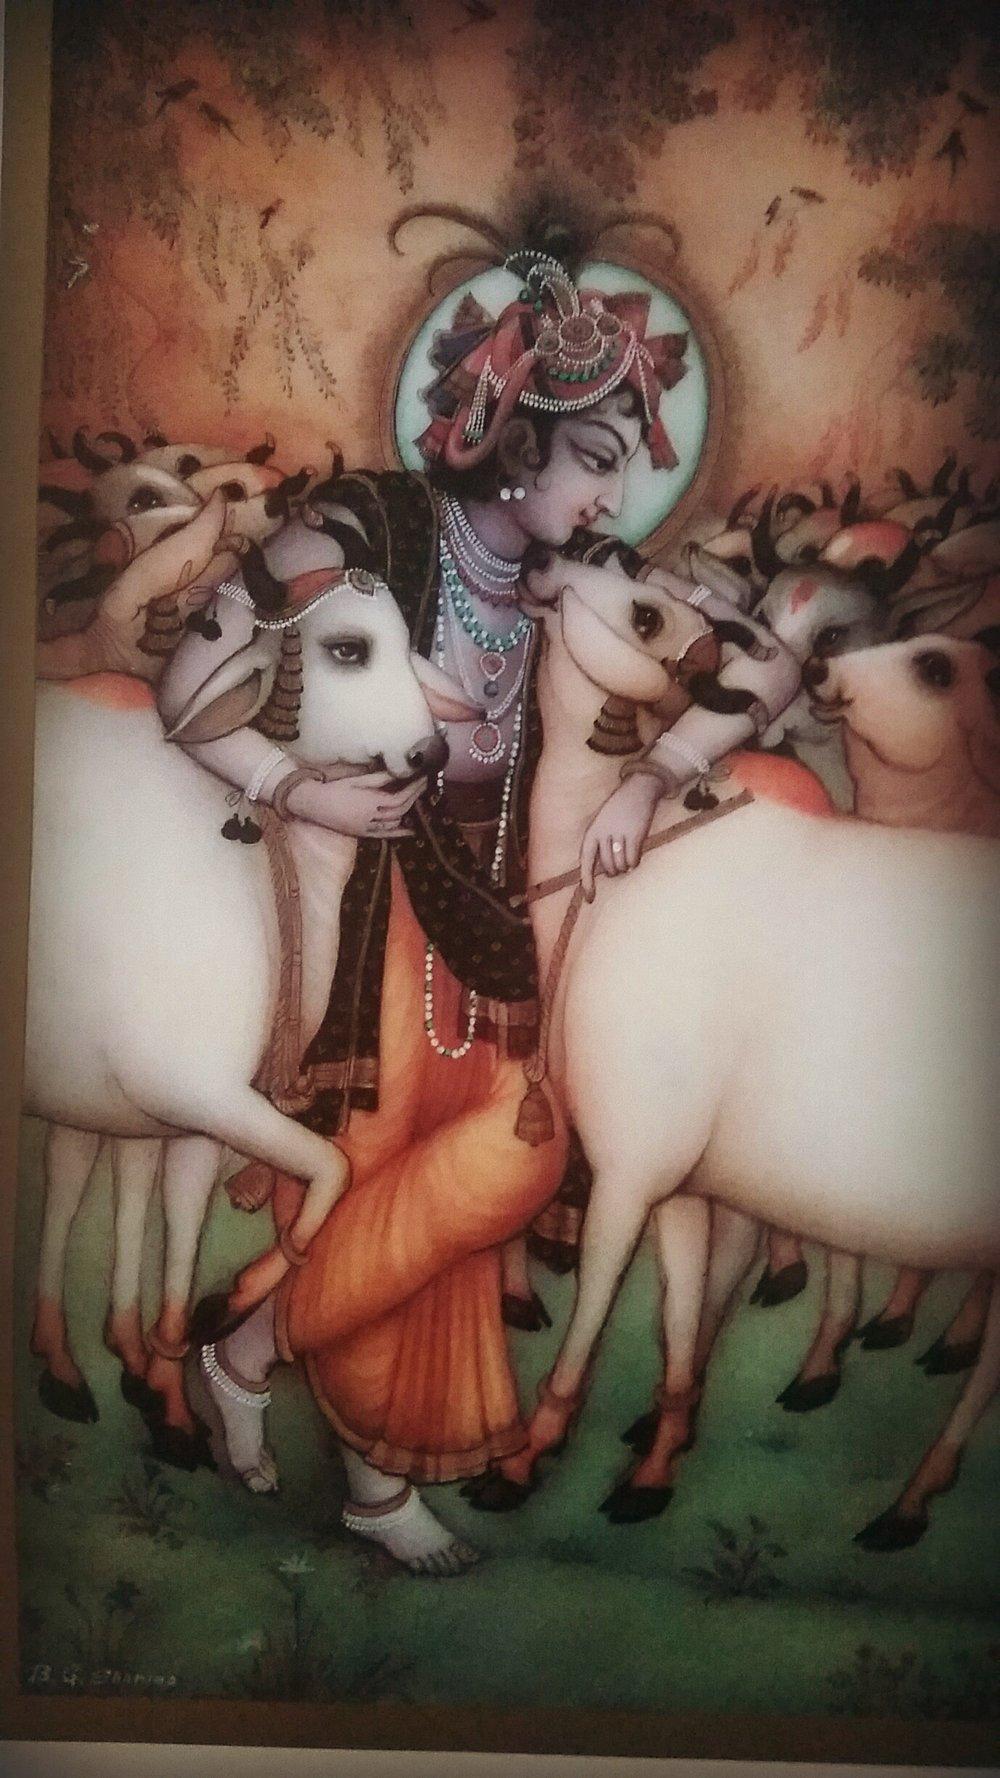 diary norm hindu image w sheep pic.jpg